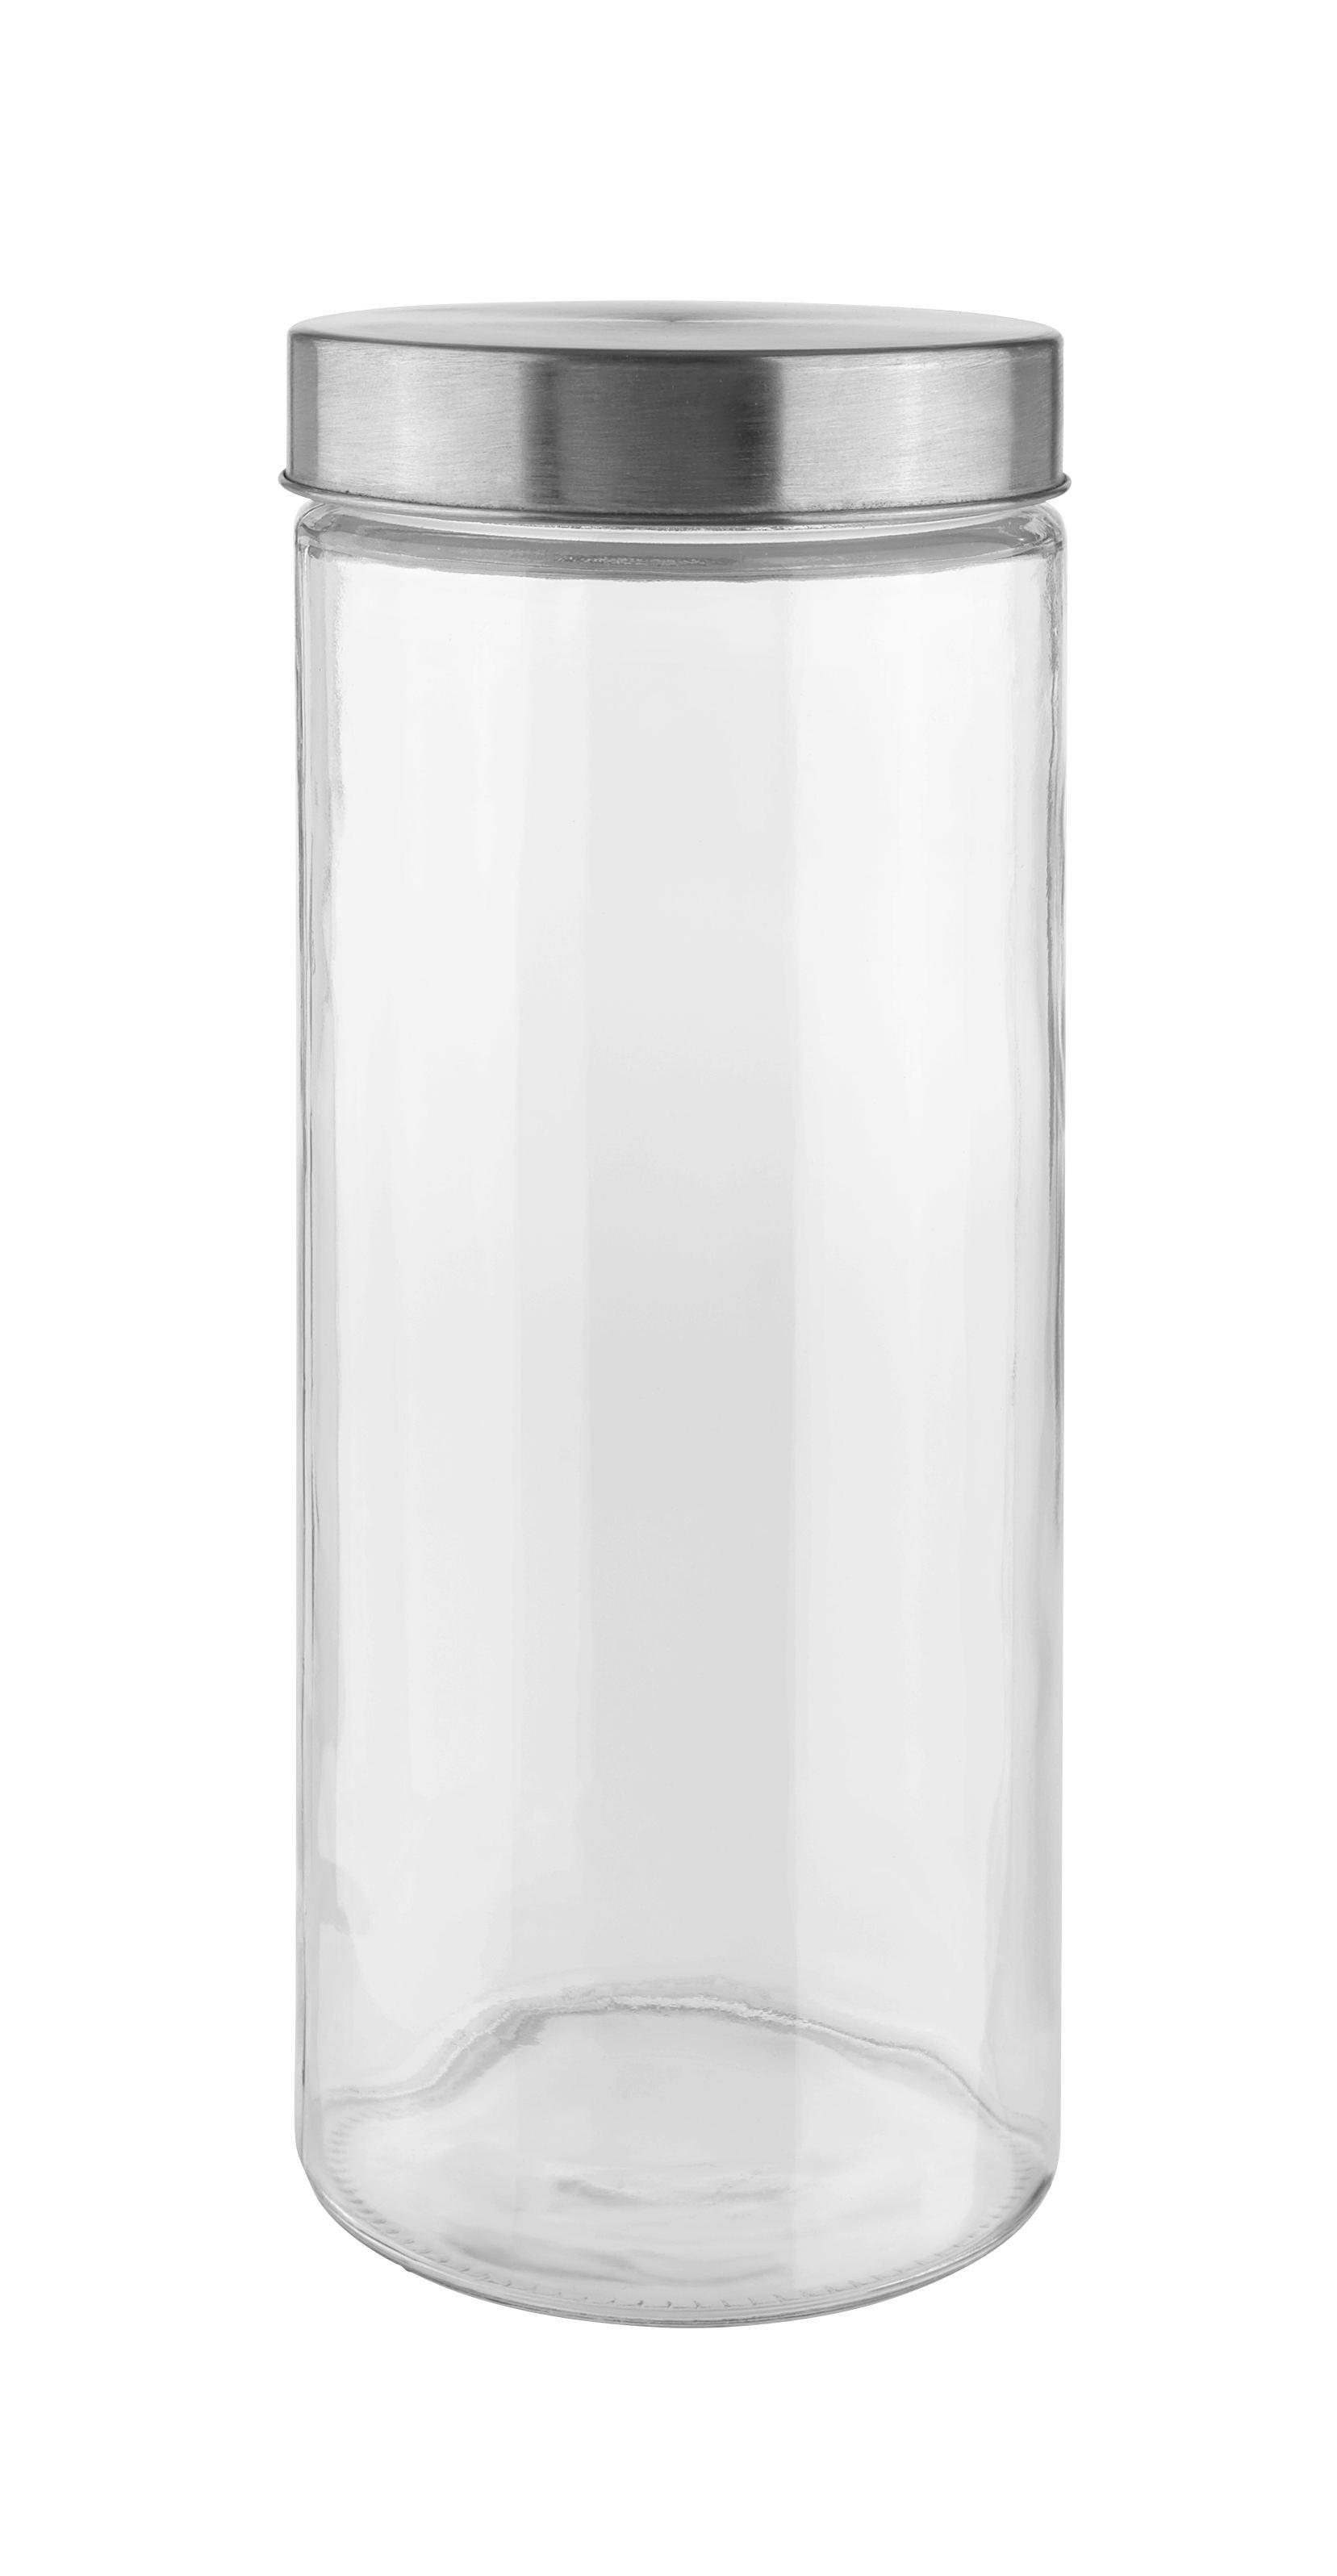 Vorratsdose Magnus in Klar aus Glas - Klar/Edelstahlfarben, MODERN, Glas/Metall (11/27,5cm) - MÖMAX modern living